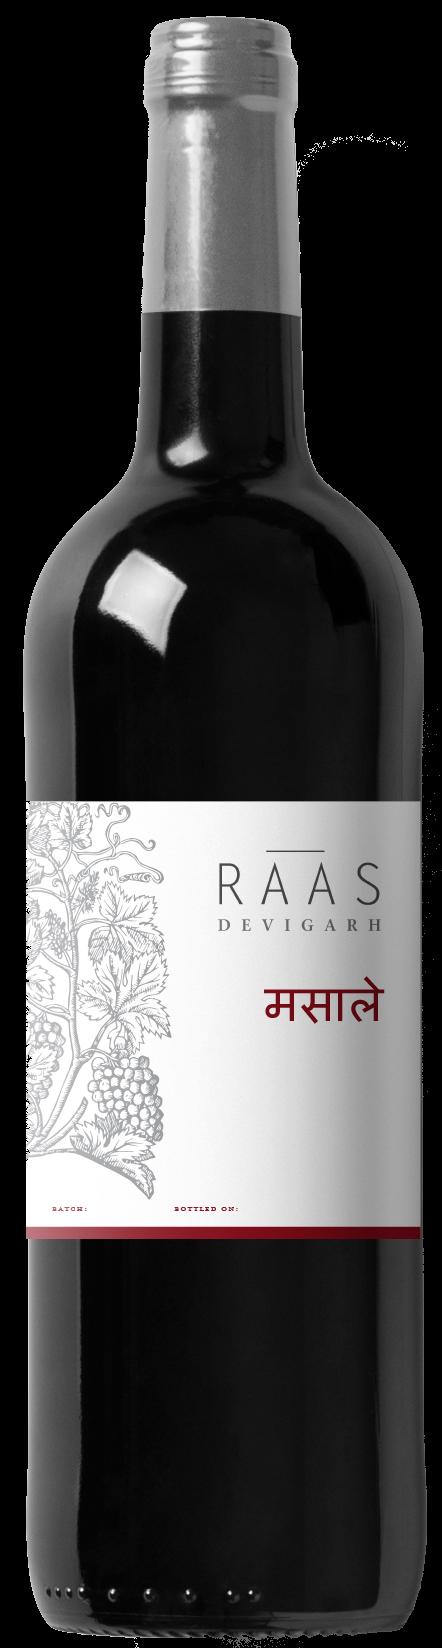 Raas bottle